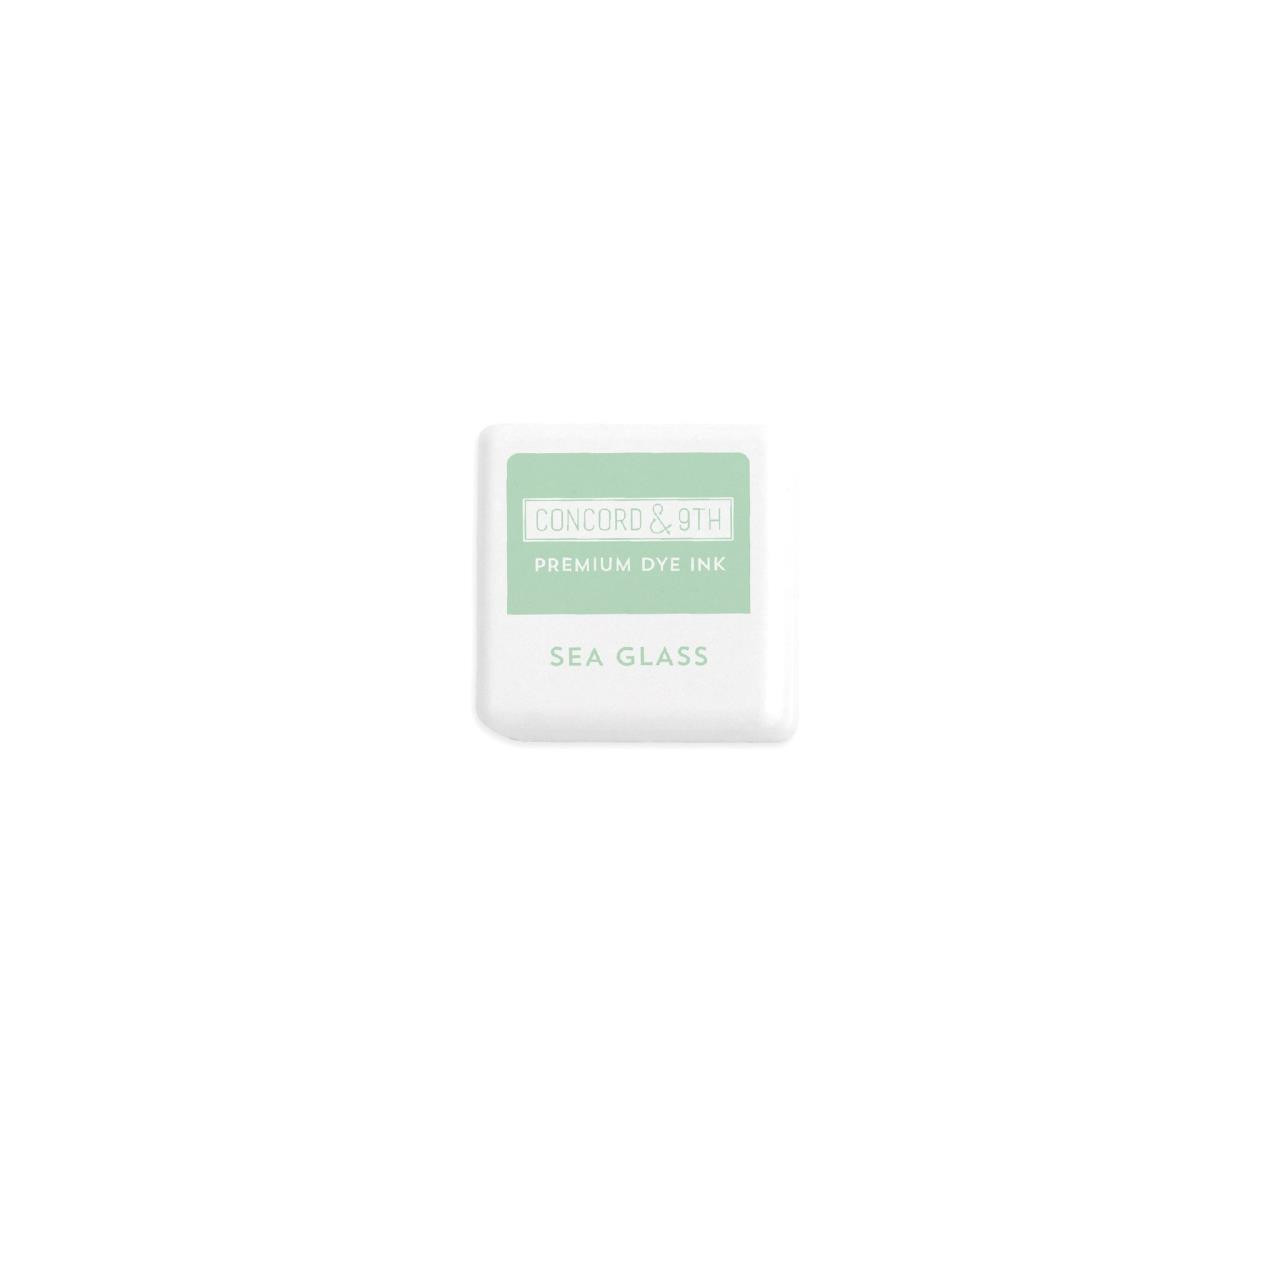 Sea Glass, Concord & 9th Premium Dye Ink Cubes - 090222402249